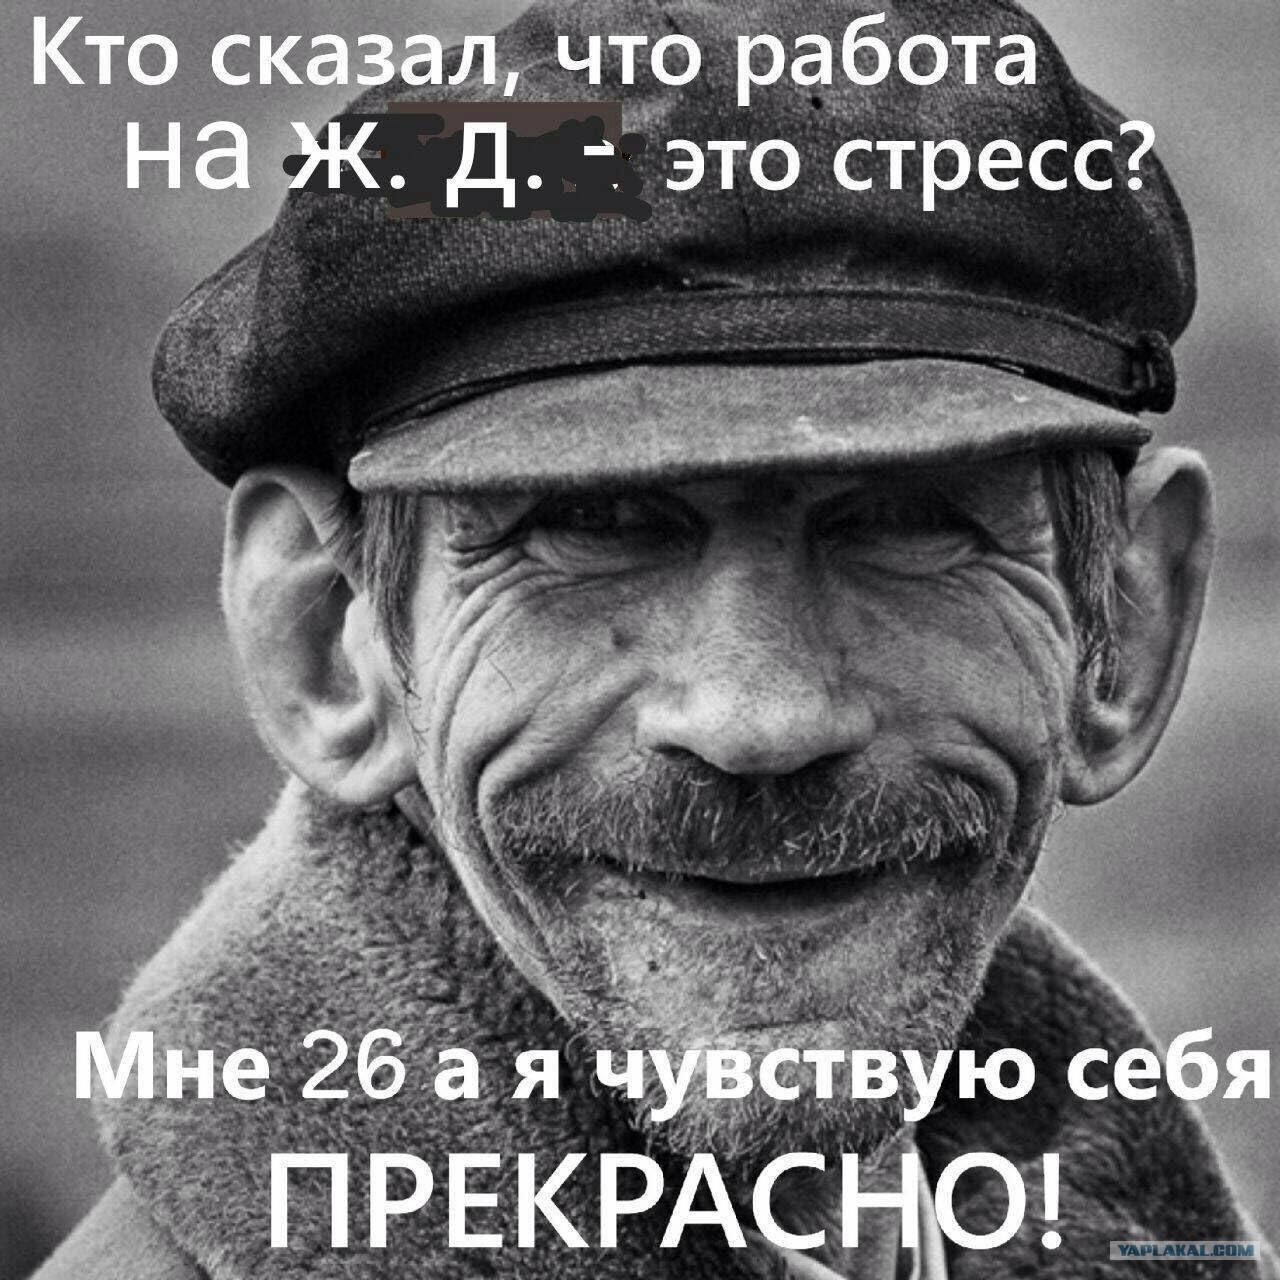 http://s00.yaplakal.com/pics/pics_original/6/9/4/11438496.jpg